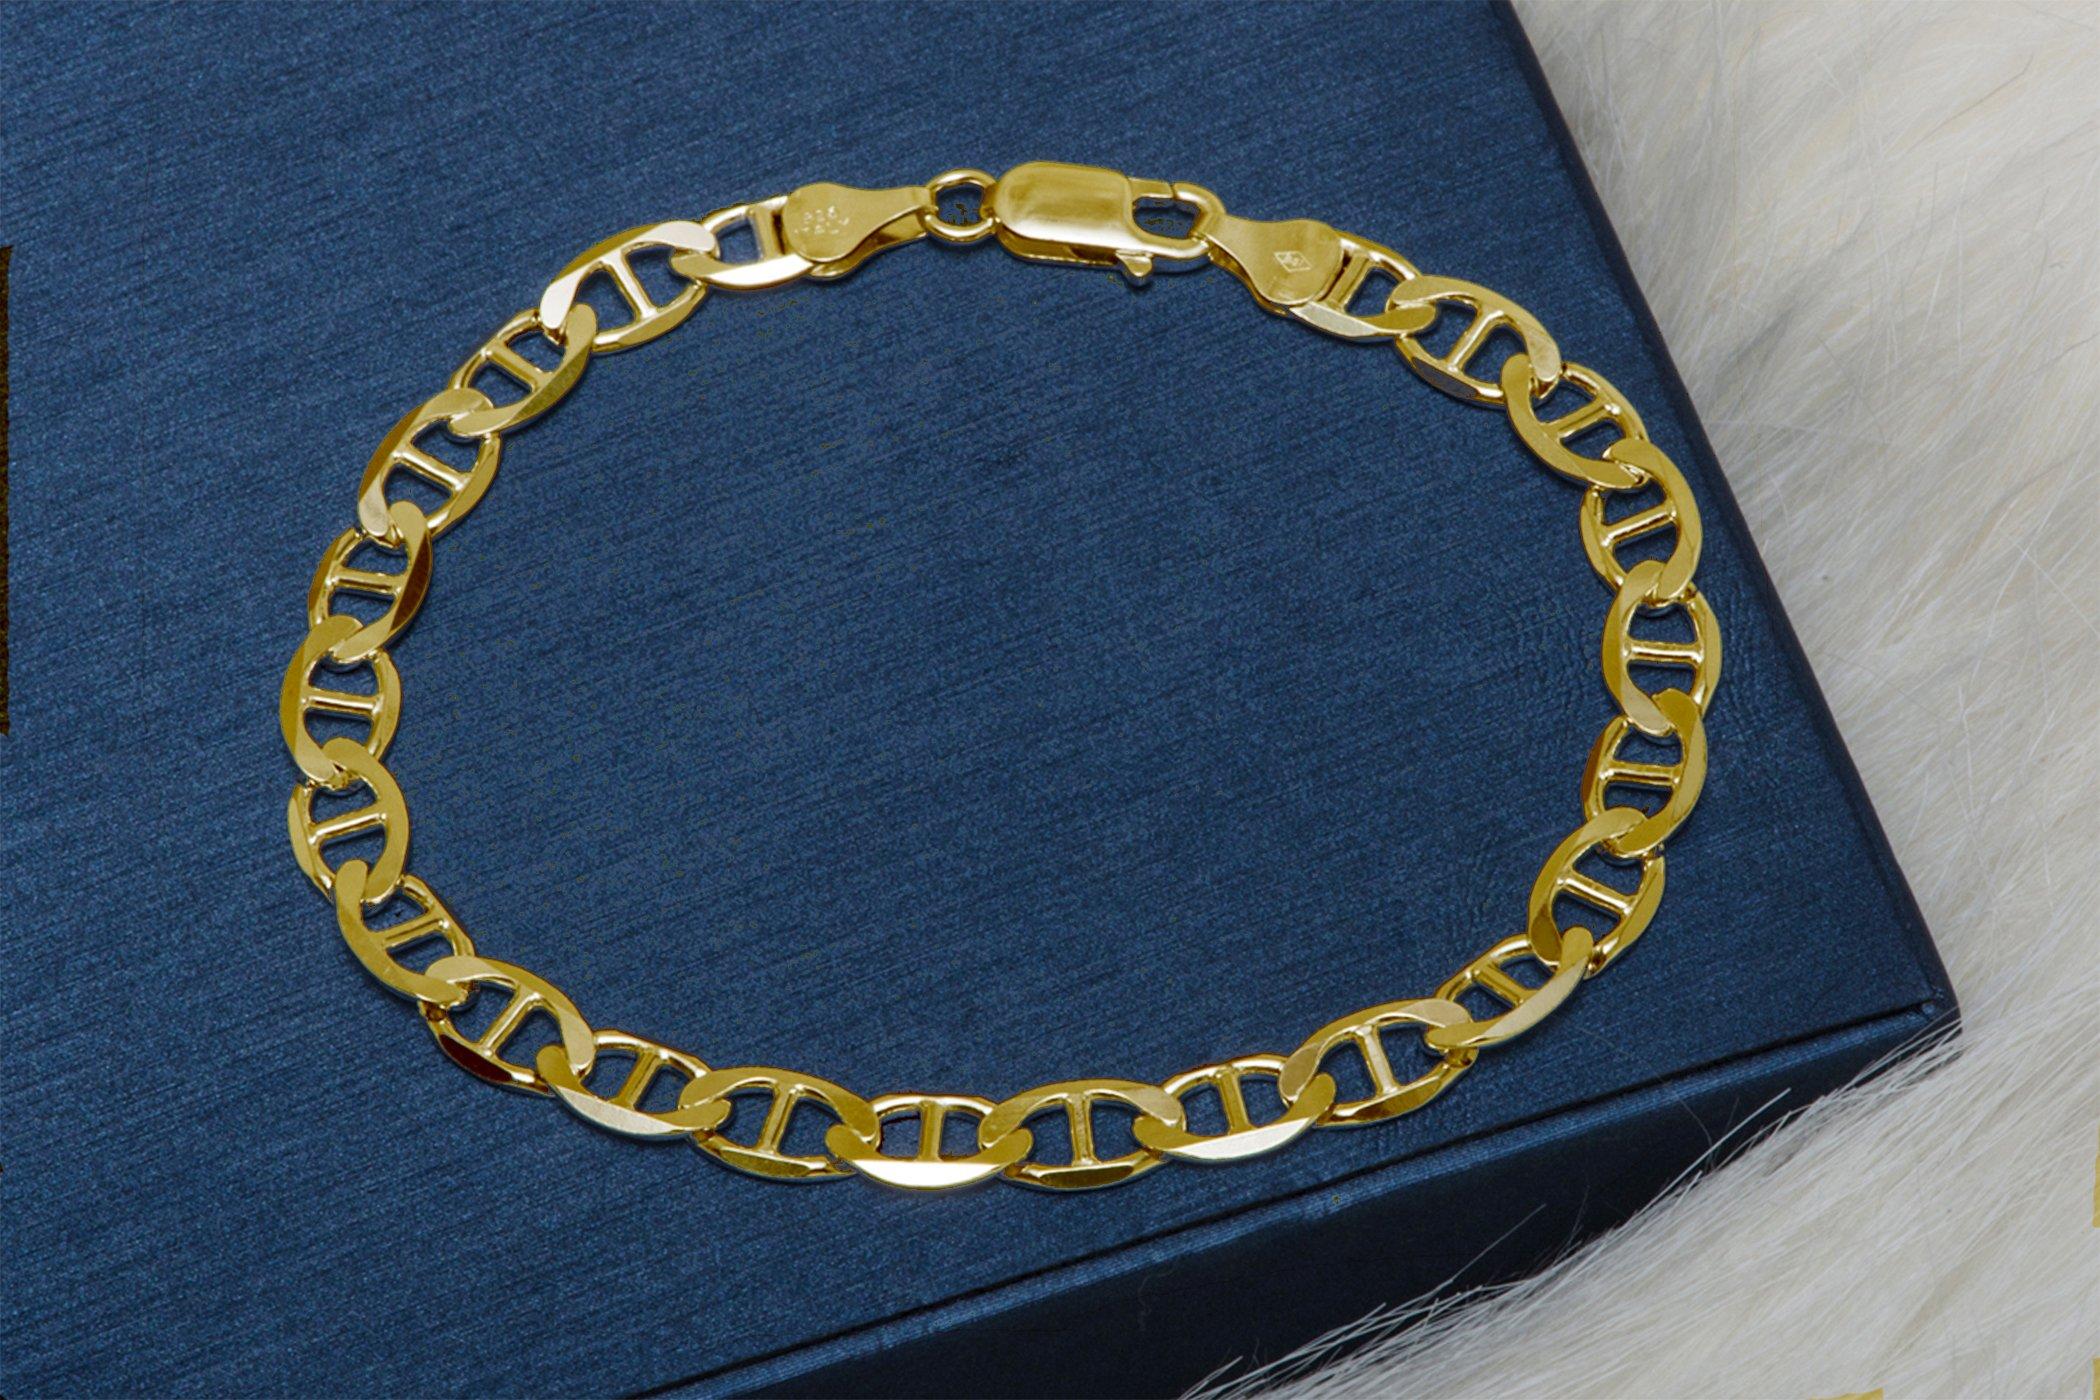 "925 Italian Sterling Silver Gold Mariner Link Chain 4.5mm Bracelet - Fine Jewelry For Men Women (8"") by Pori Jewelers (Image #2)"